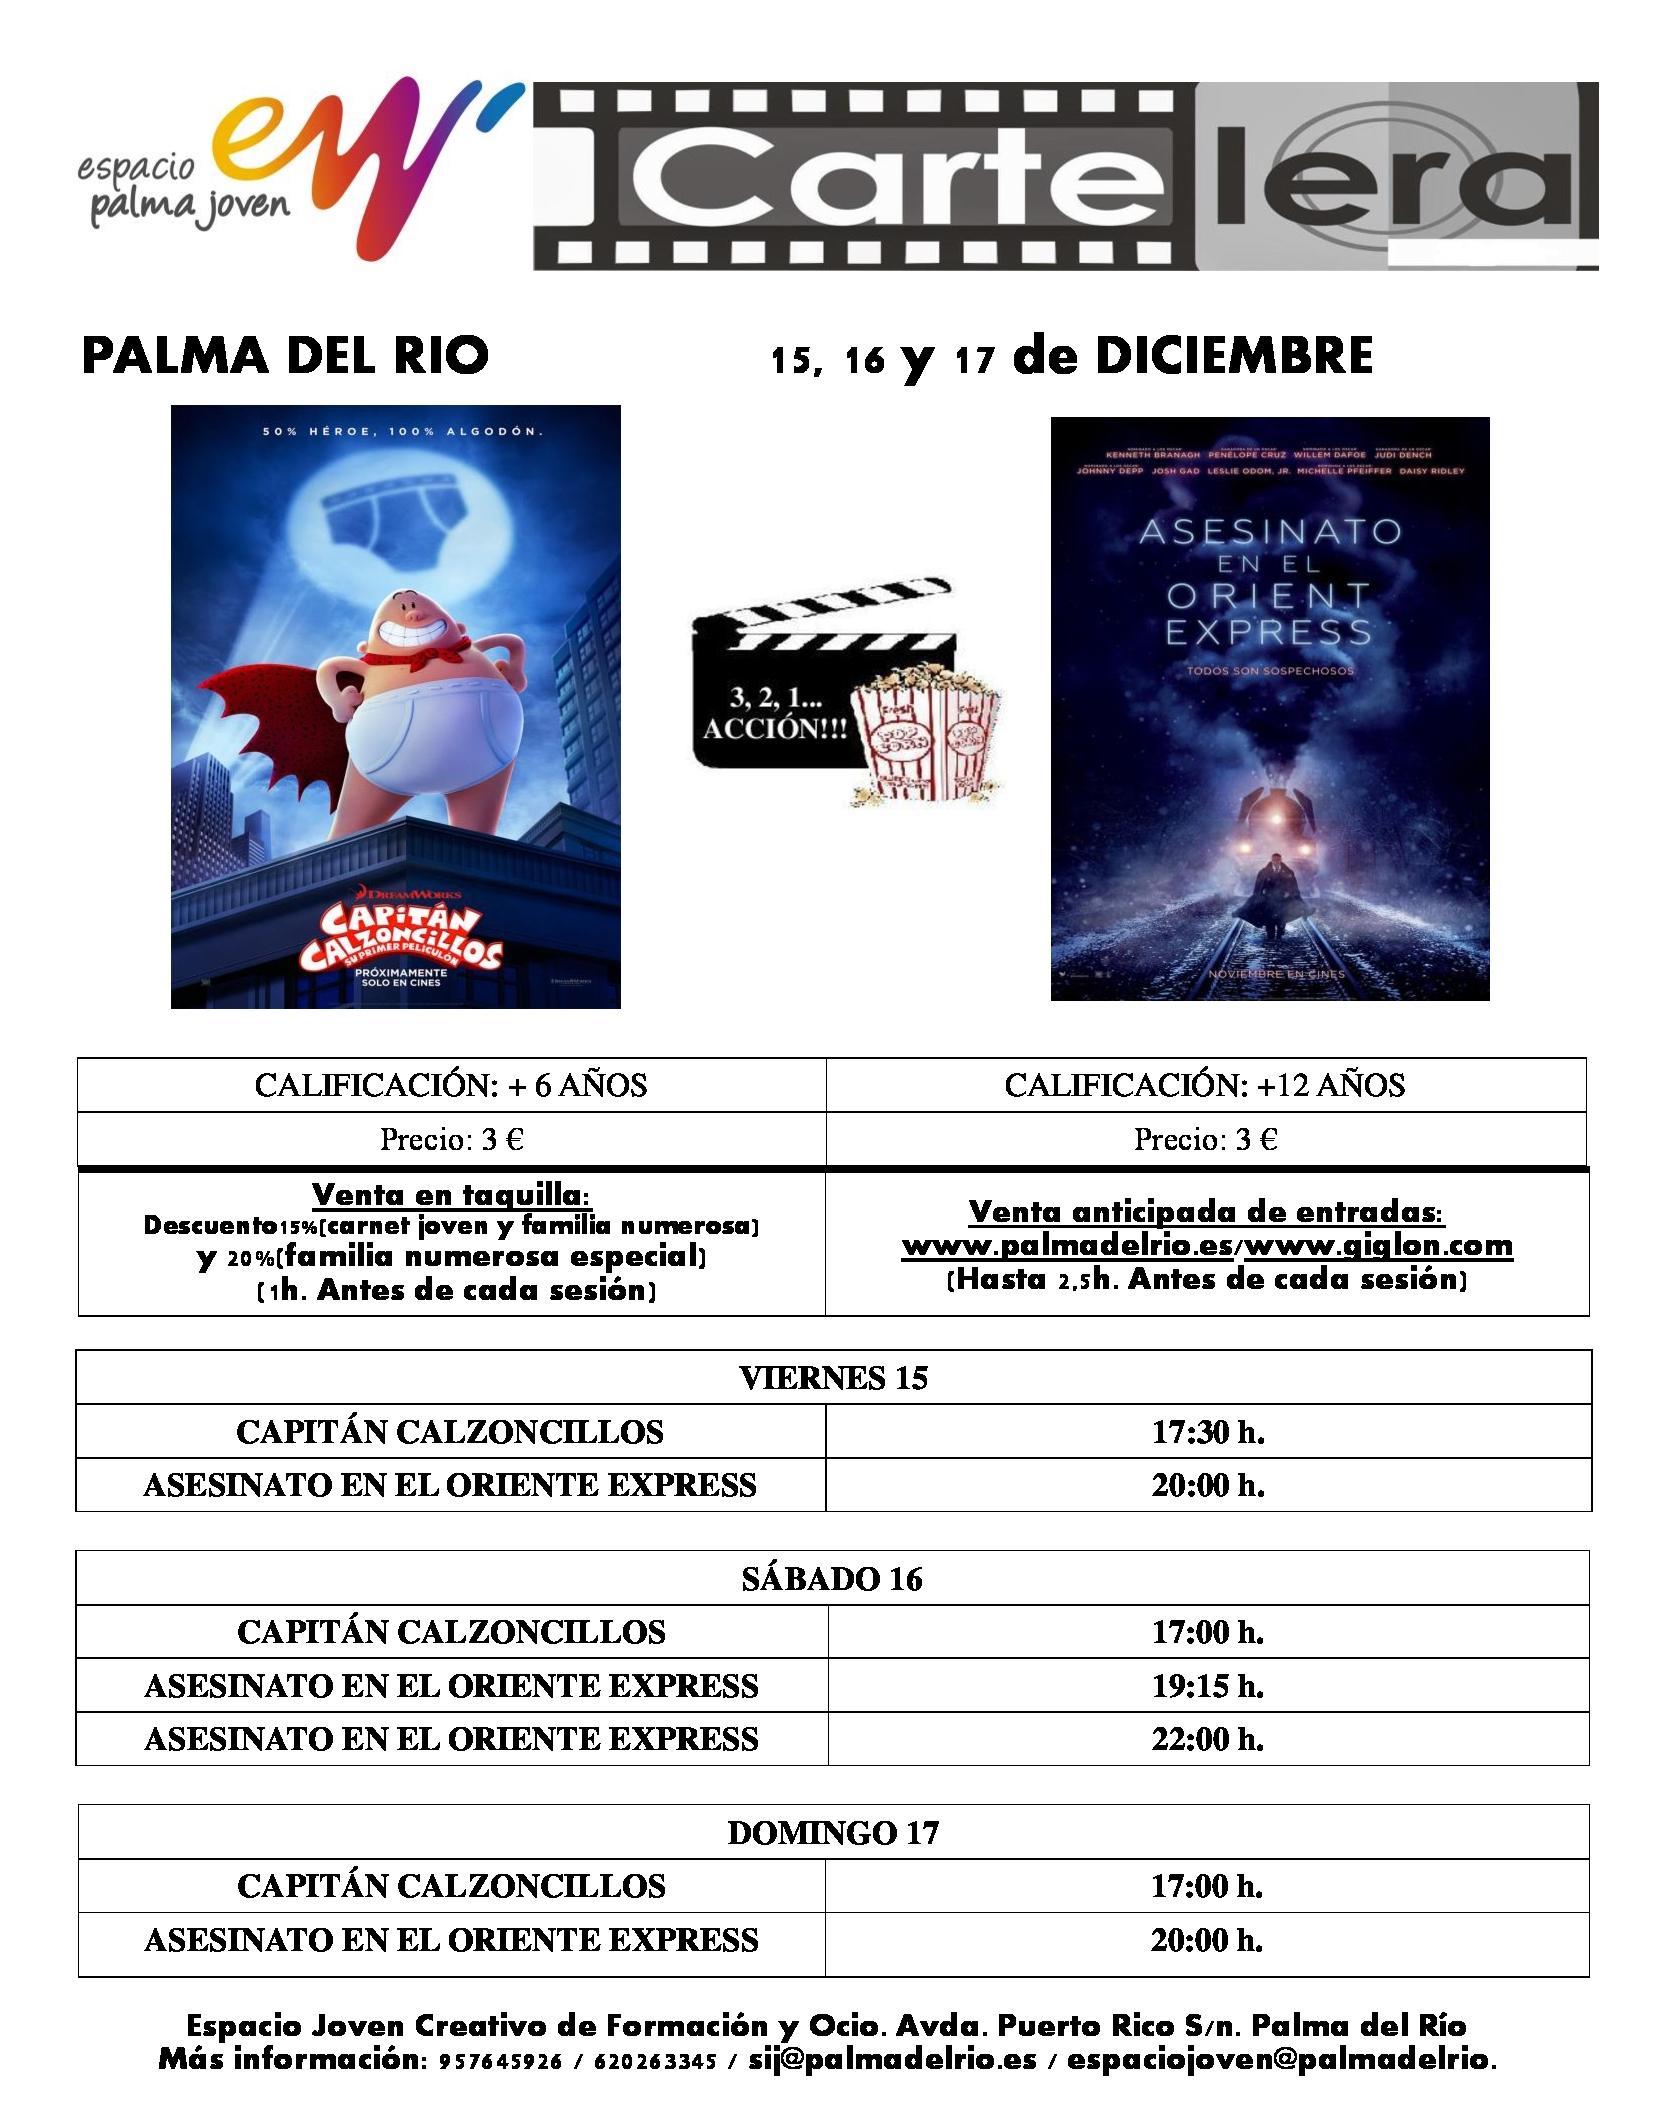 https://www.palmadelrio.es/sites/default/files/cine_15.16.17_diciembre_2017.jpg